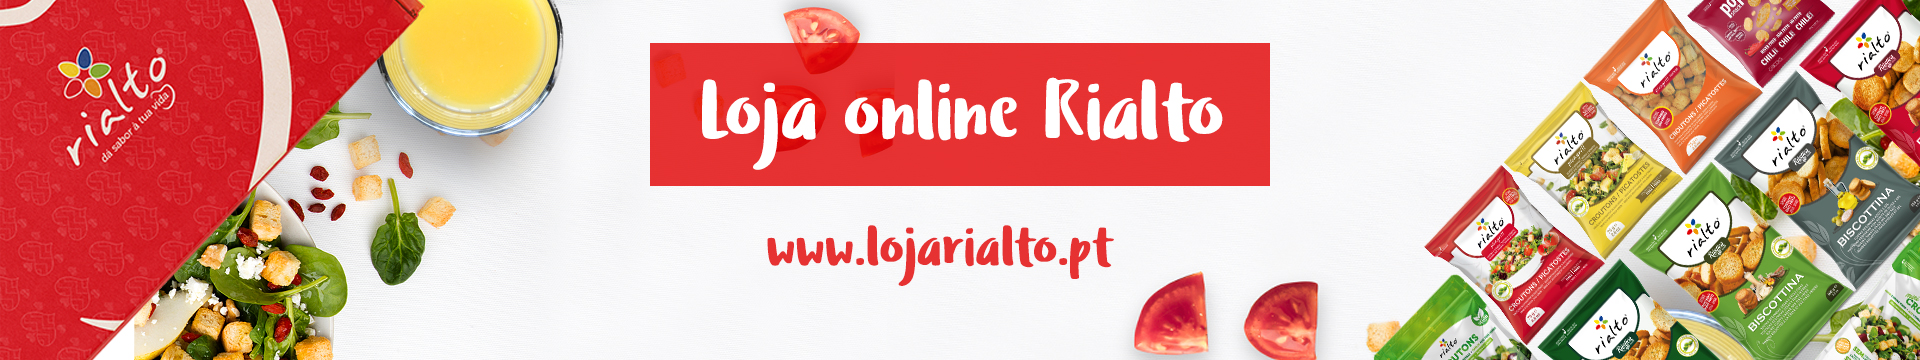 Loja Online Rialto